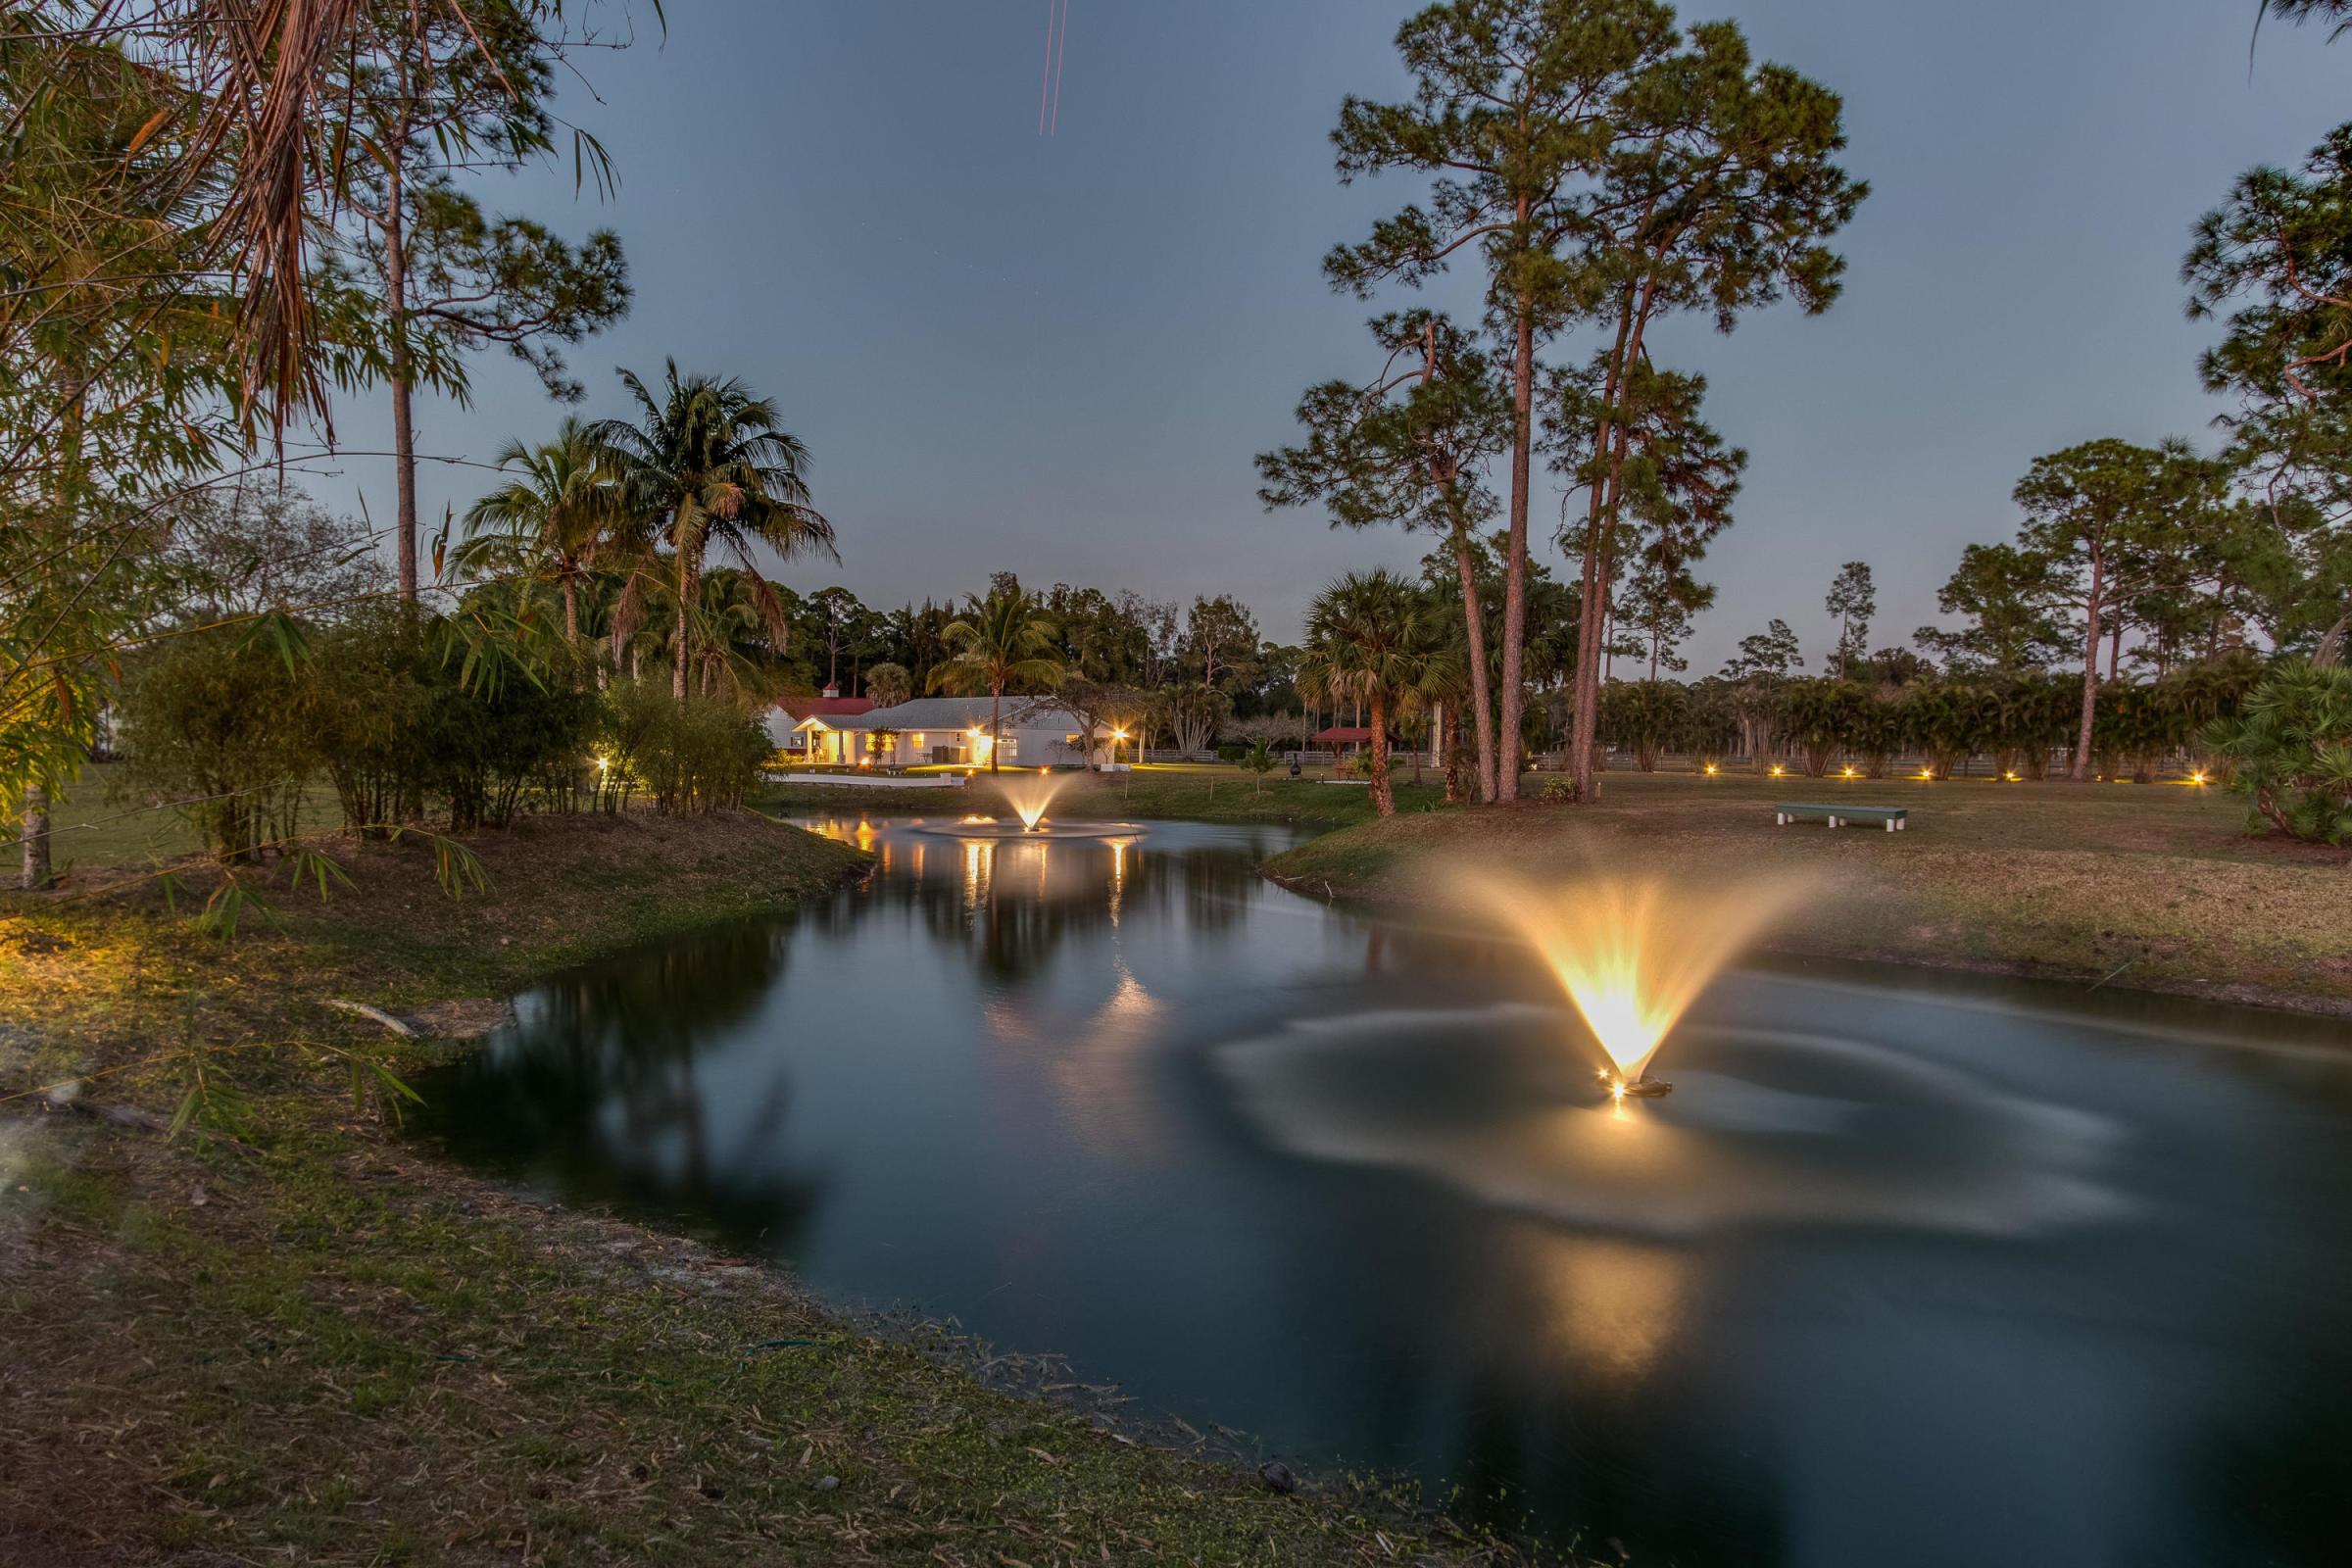 Twilight Pond Fountains